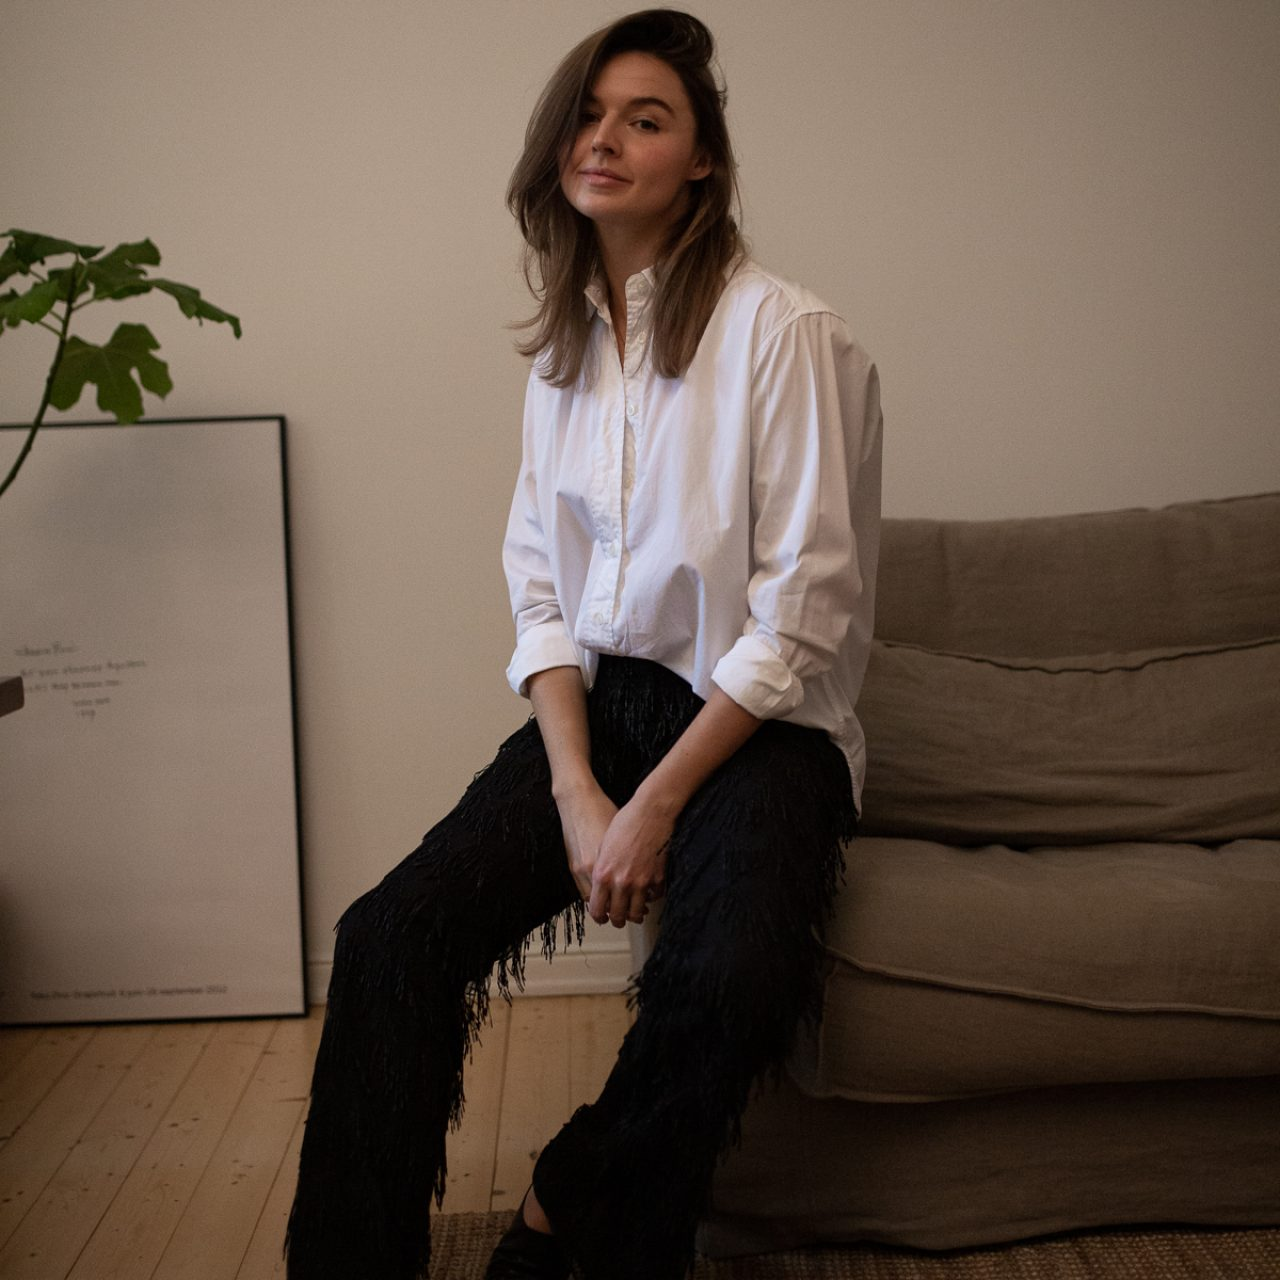 Joanna Frick